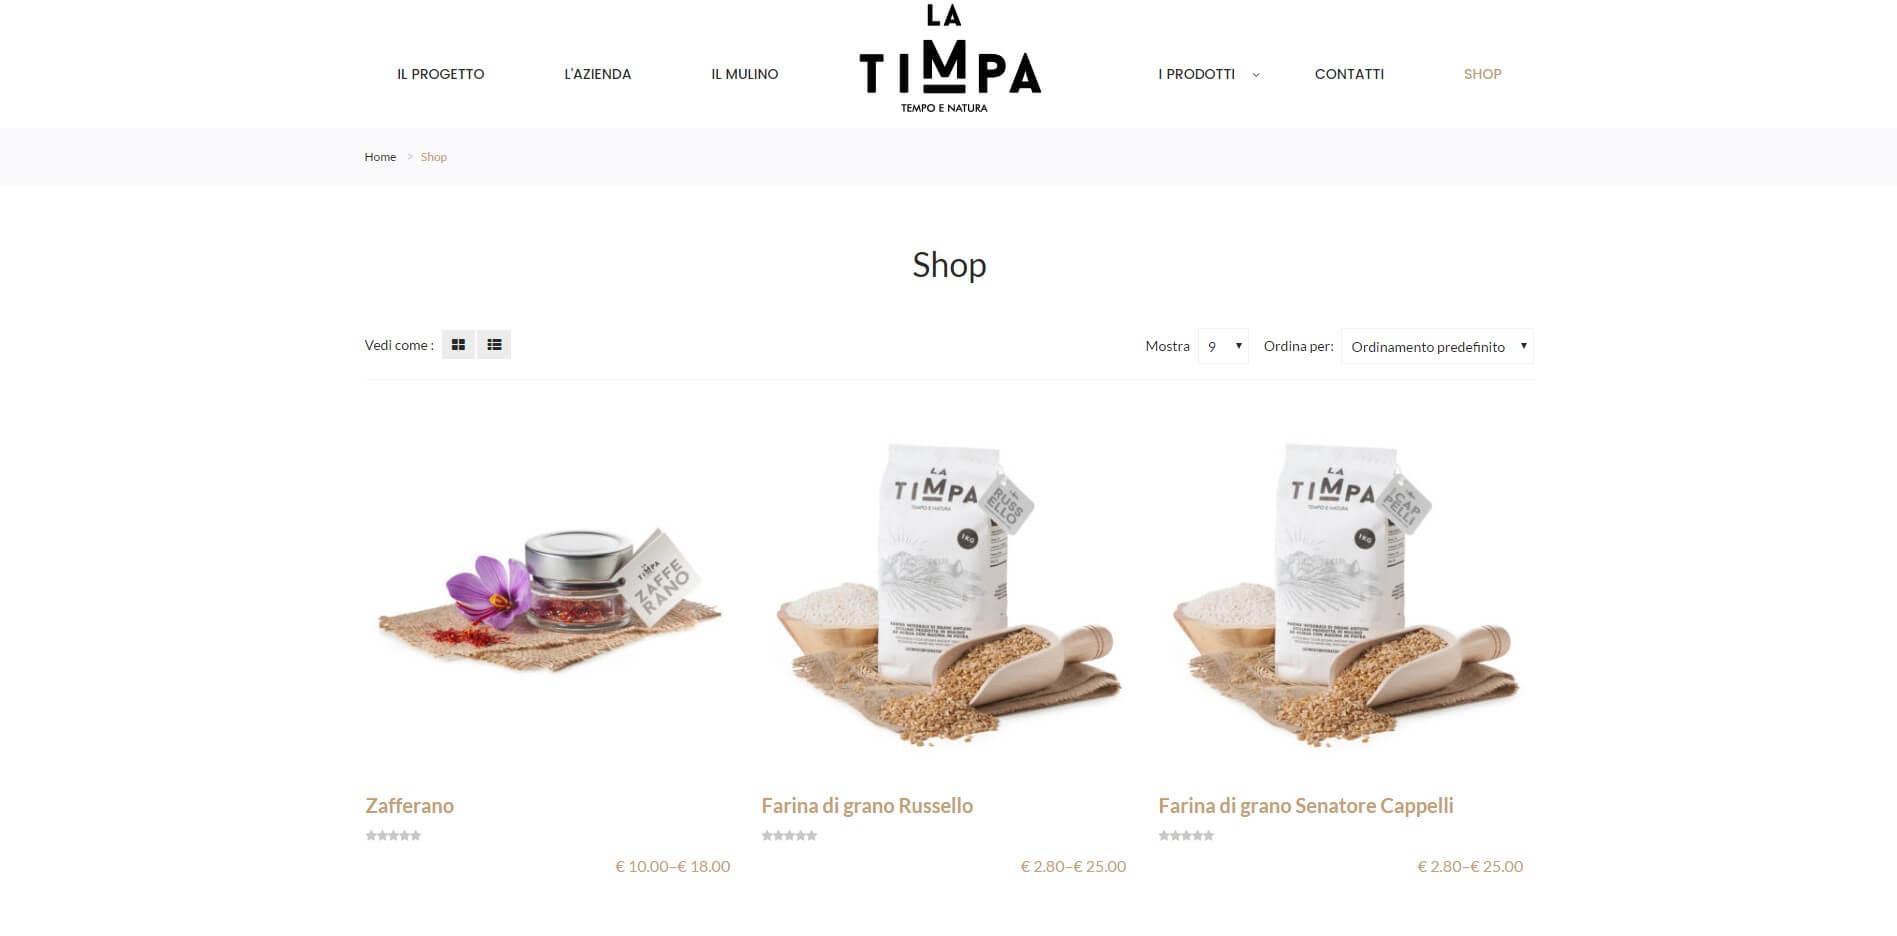 latimpa-shop